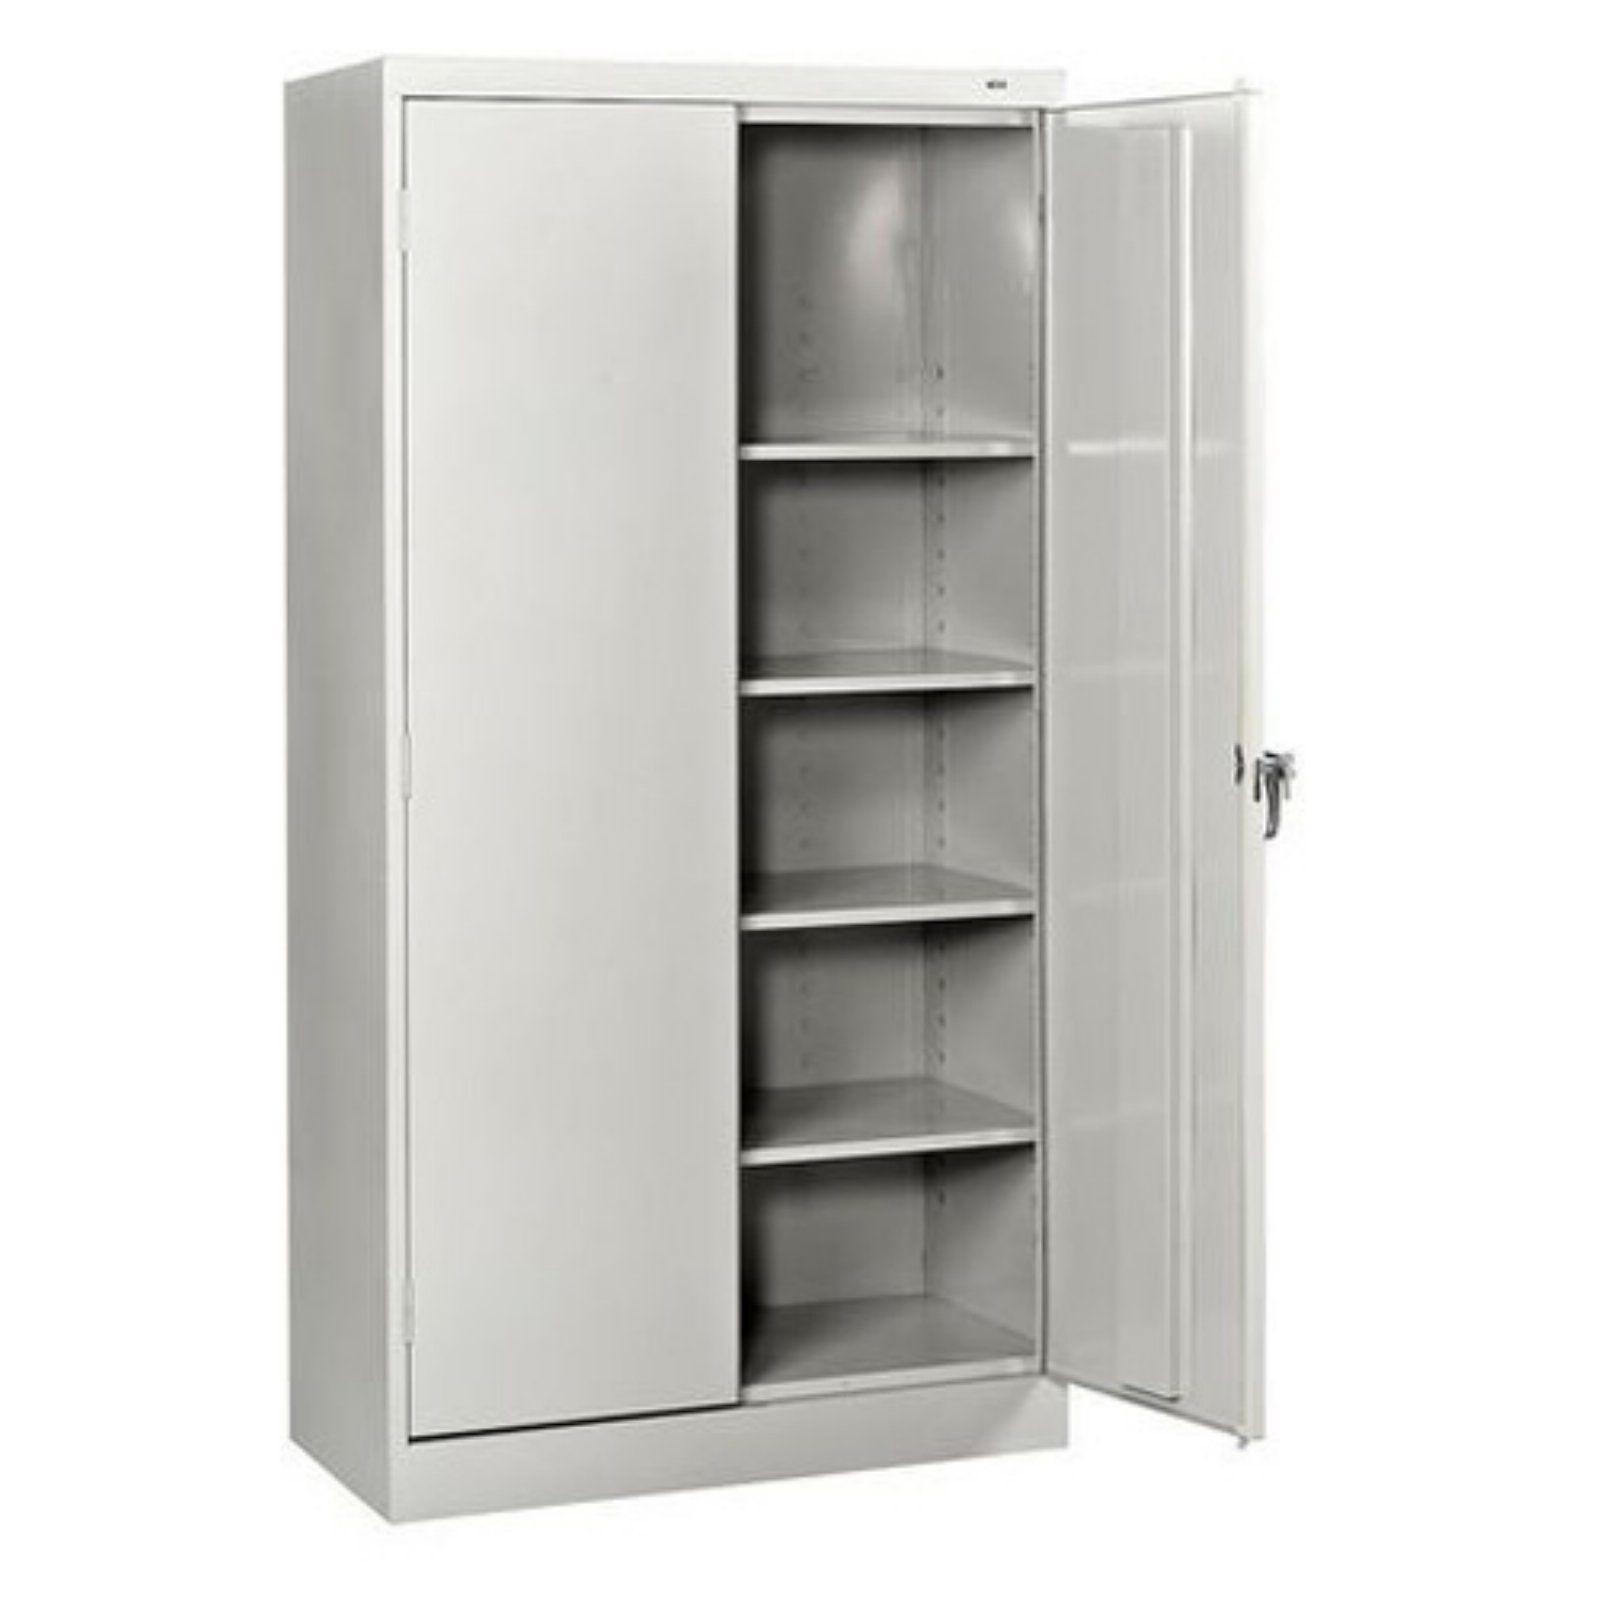 Tennsco Standard Welded Storage Cabinet In 2019 Products Cabinet